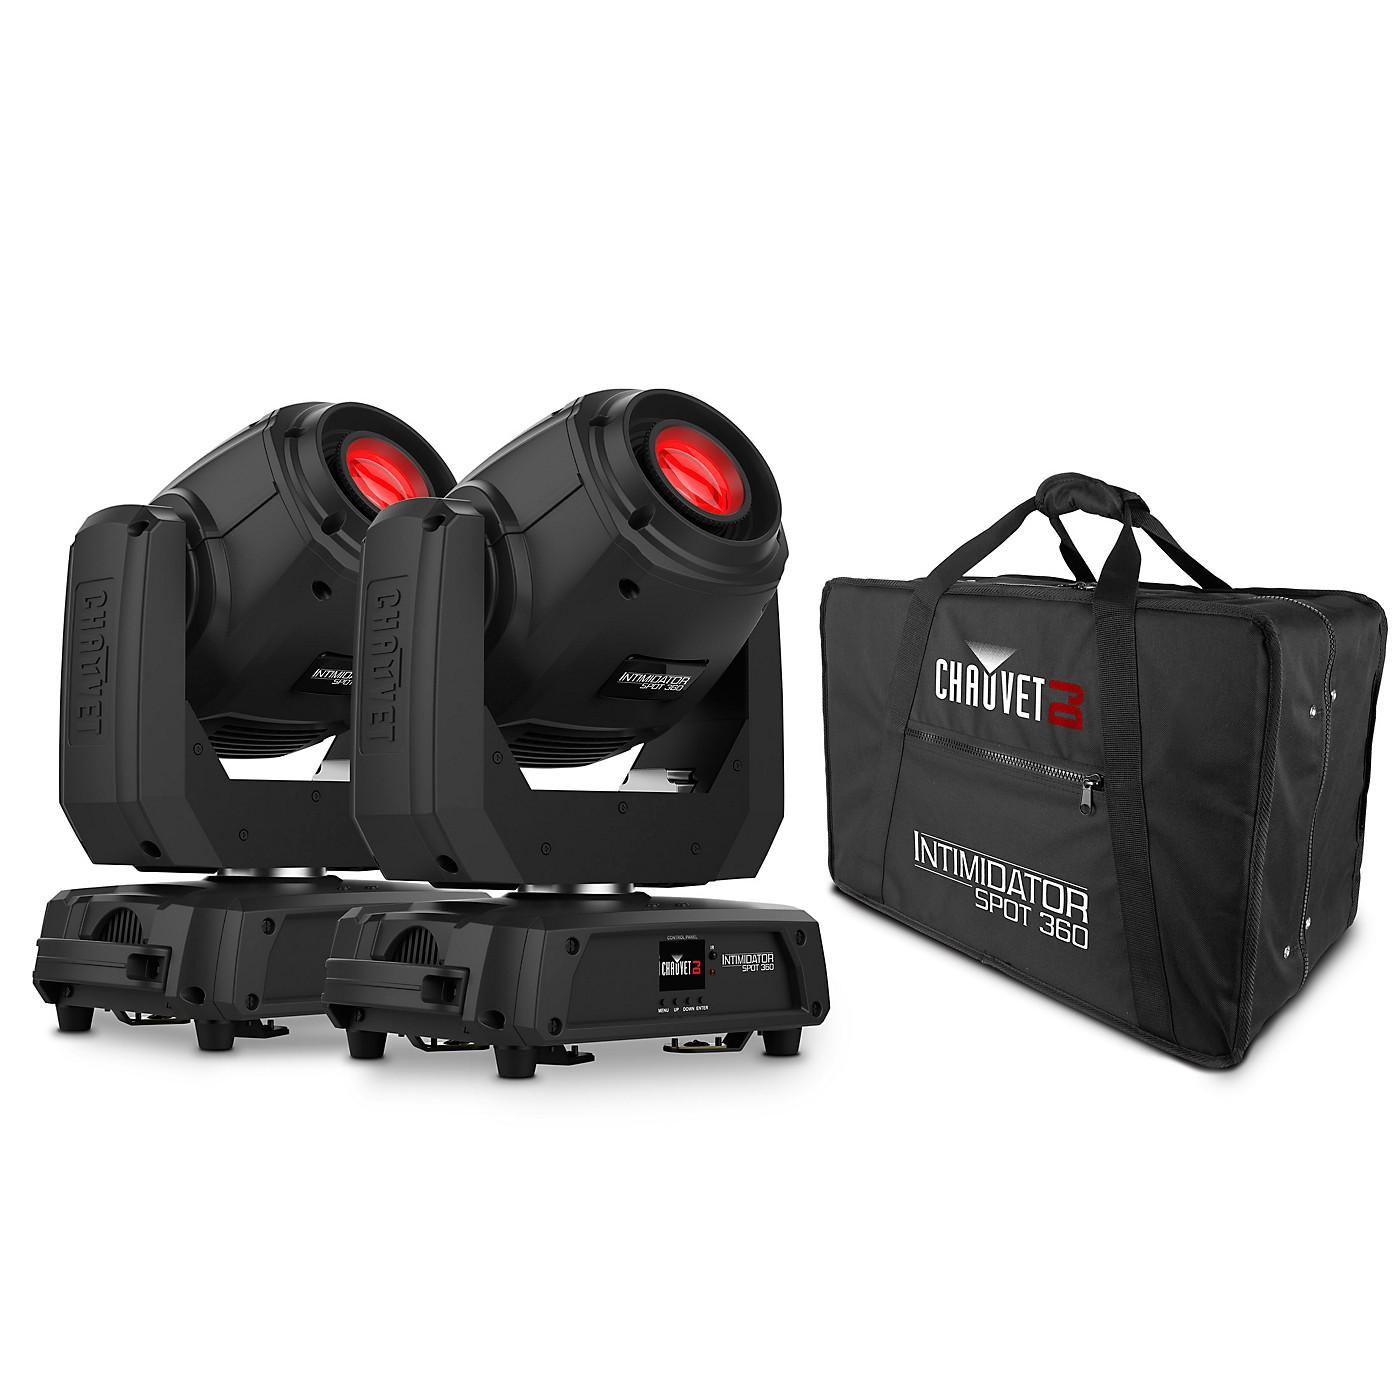 CHAUVET DJ Intimidator Spot 360 LED Spotlight (Pair) with CHS-360 Case thumbnail